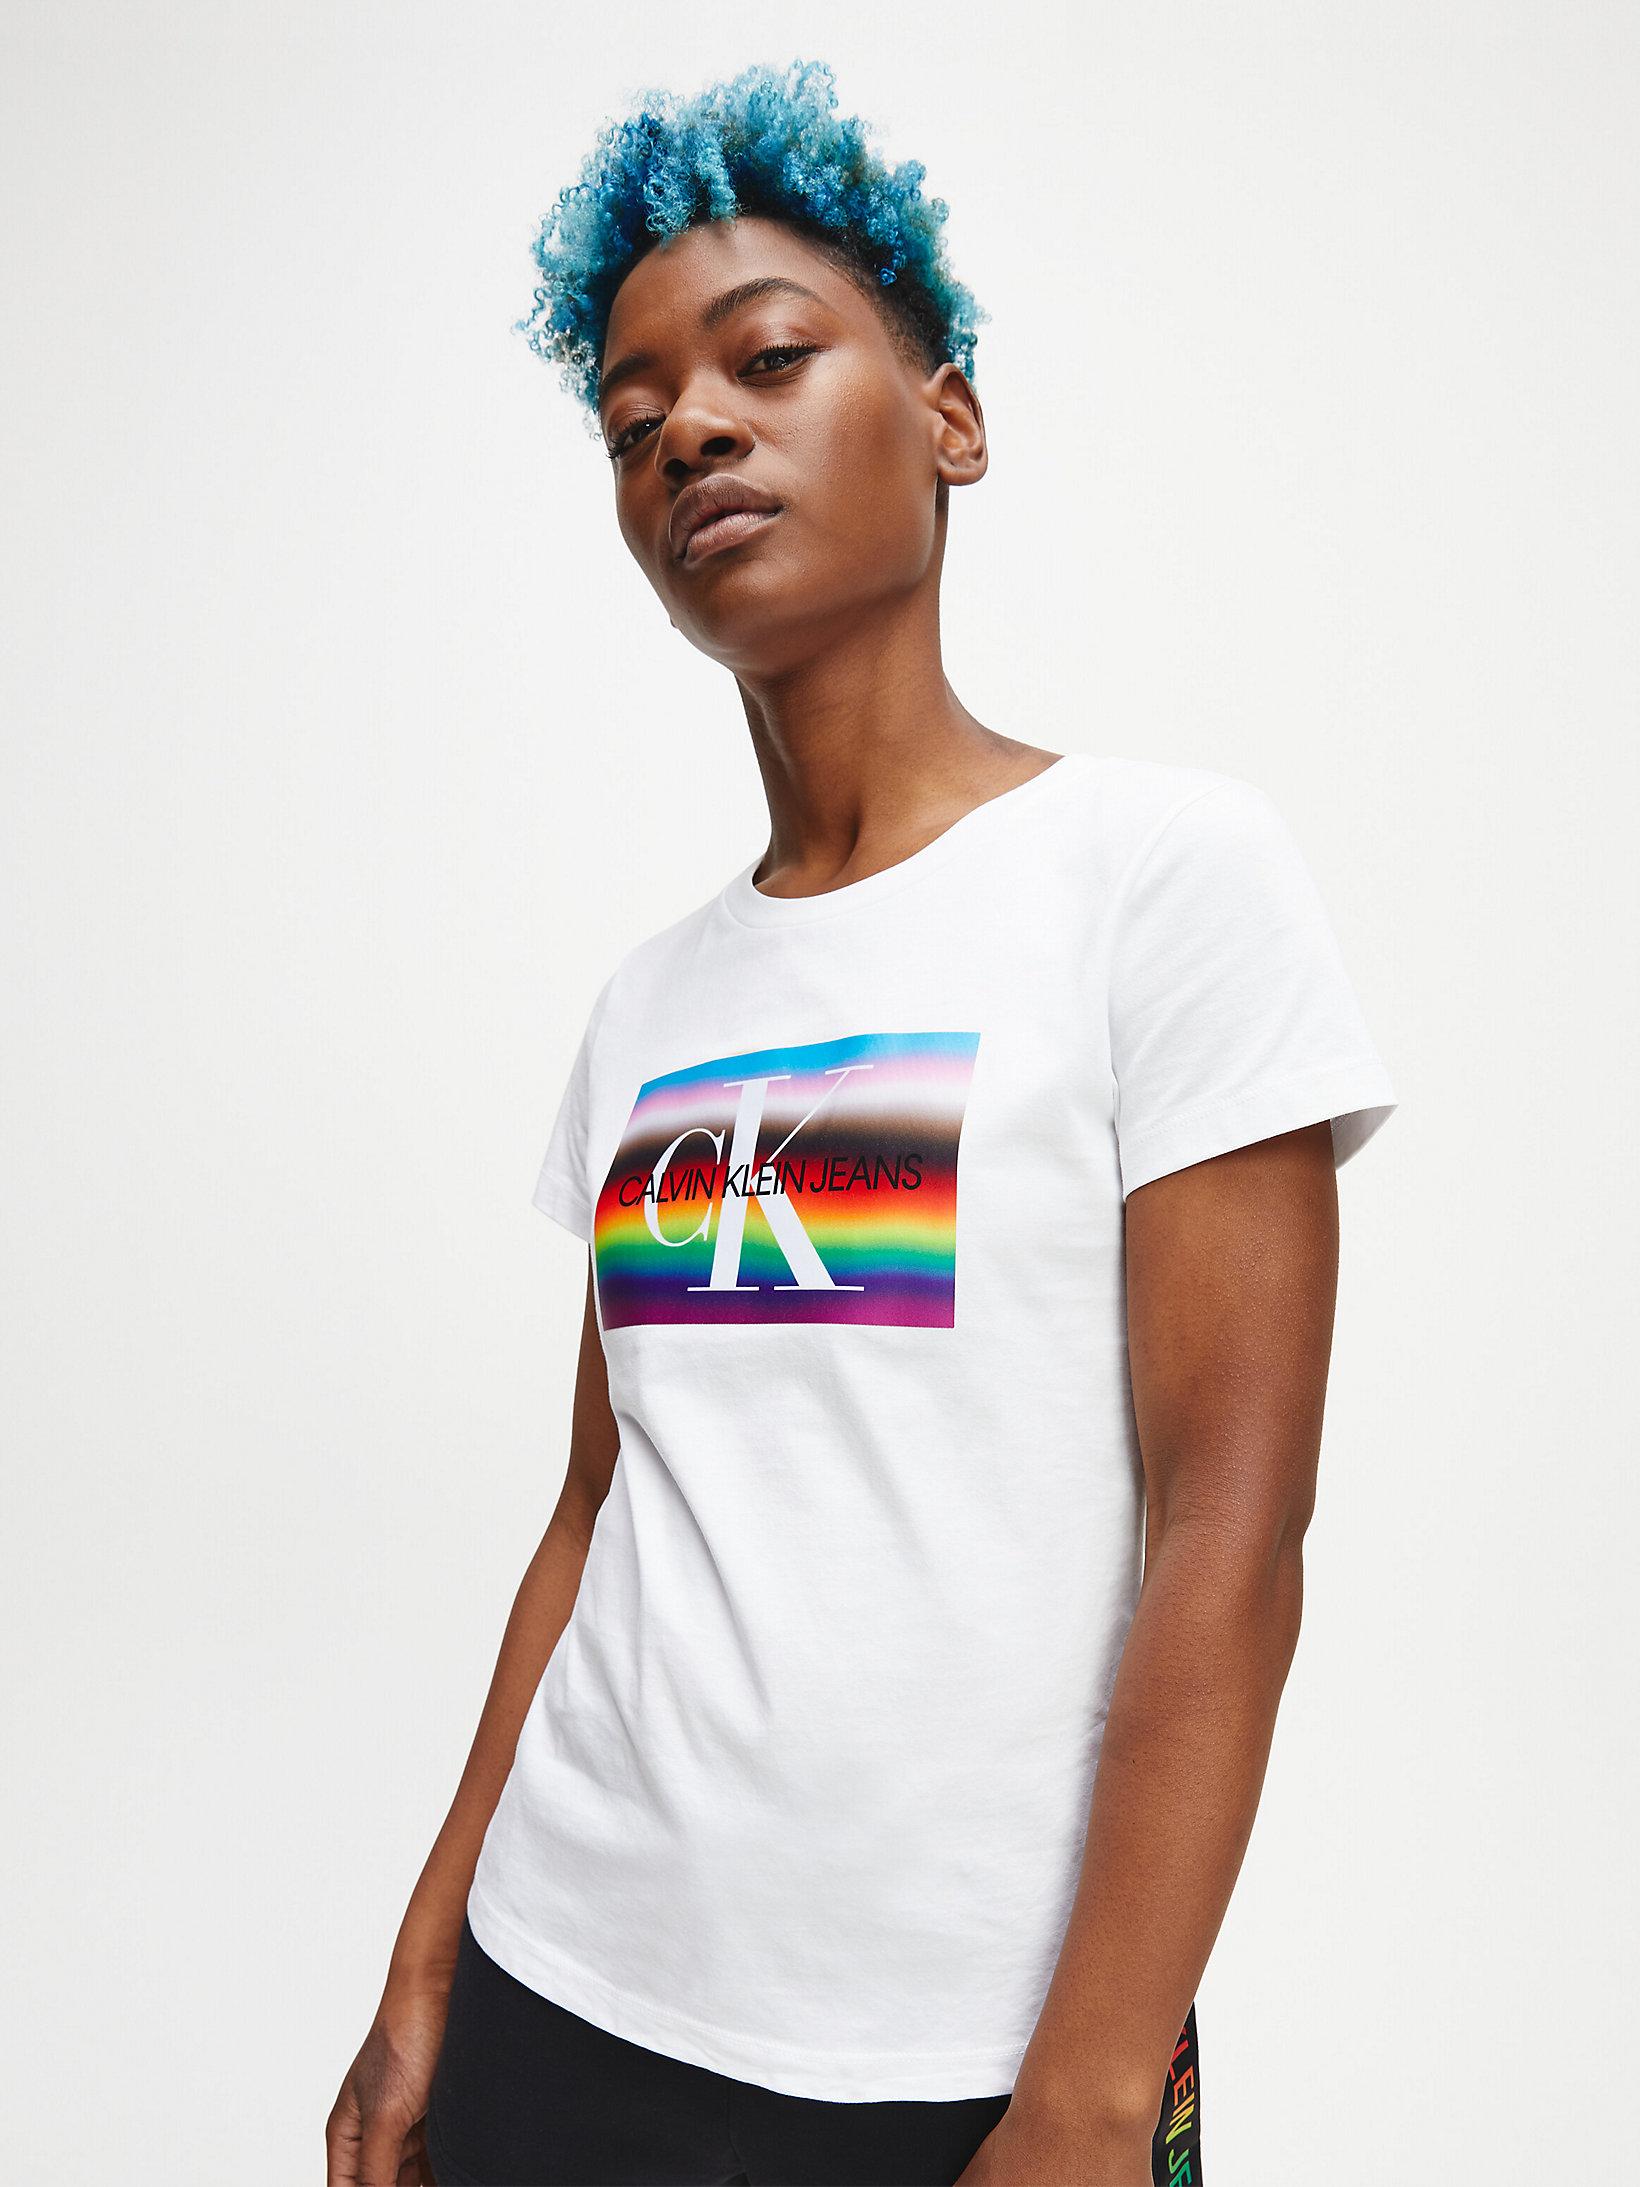 ??PRODUCT_IMAGE_ALT_TEXT??? | T-shirt slim in cotone biologico con logo arcobaleno,BRIGHT WHITE,donna,CALVIN KLEIN JEANS